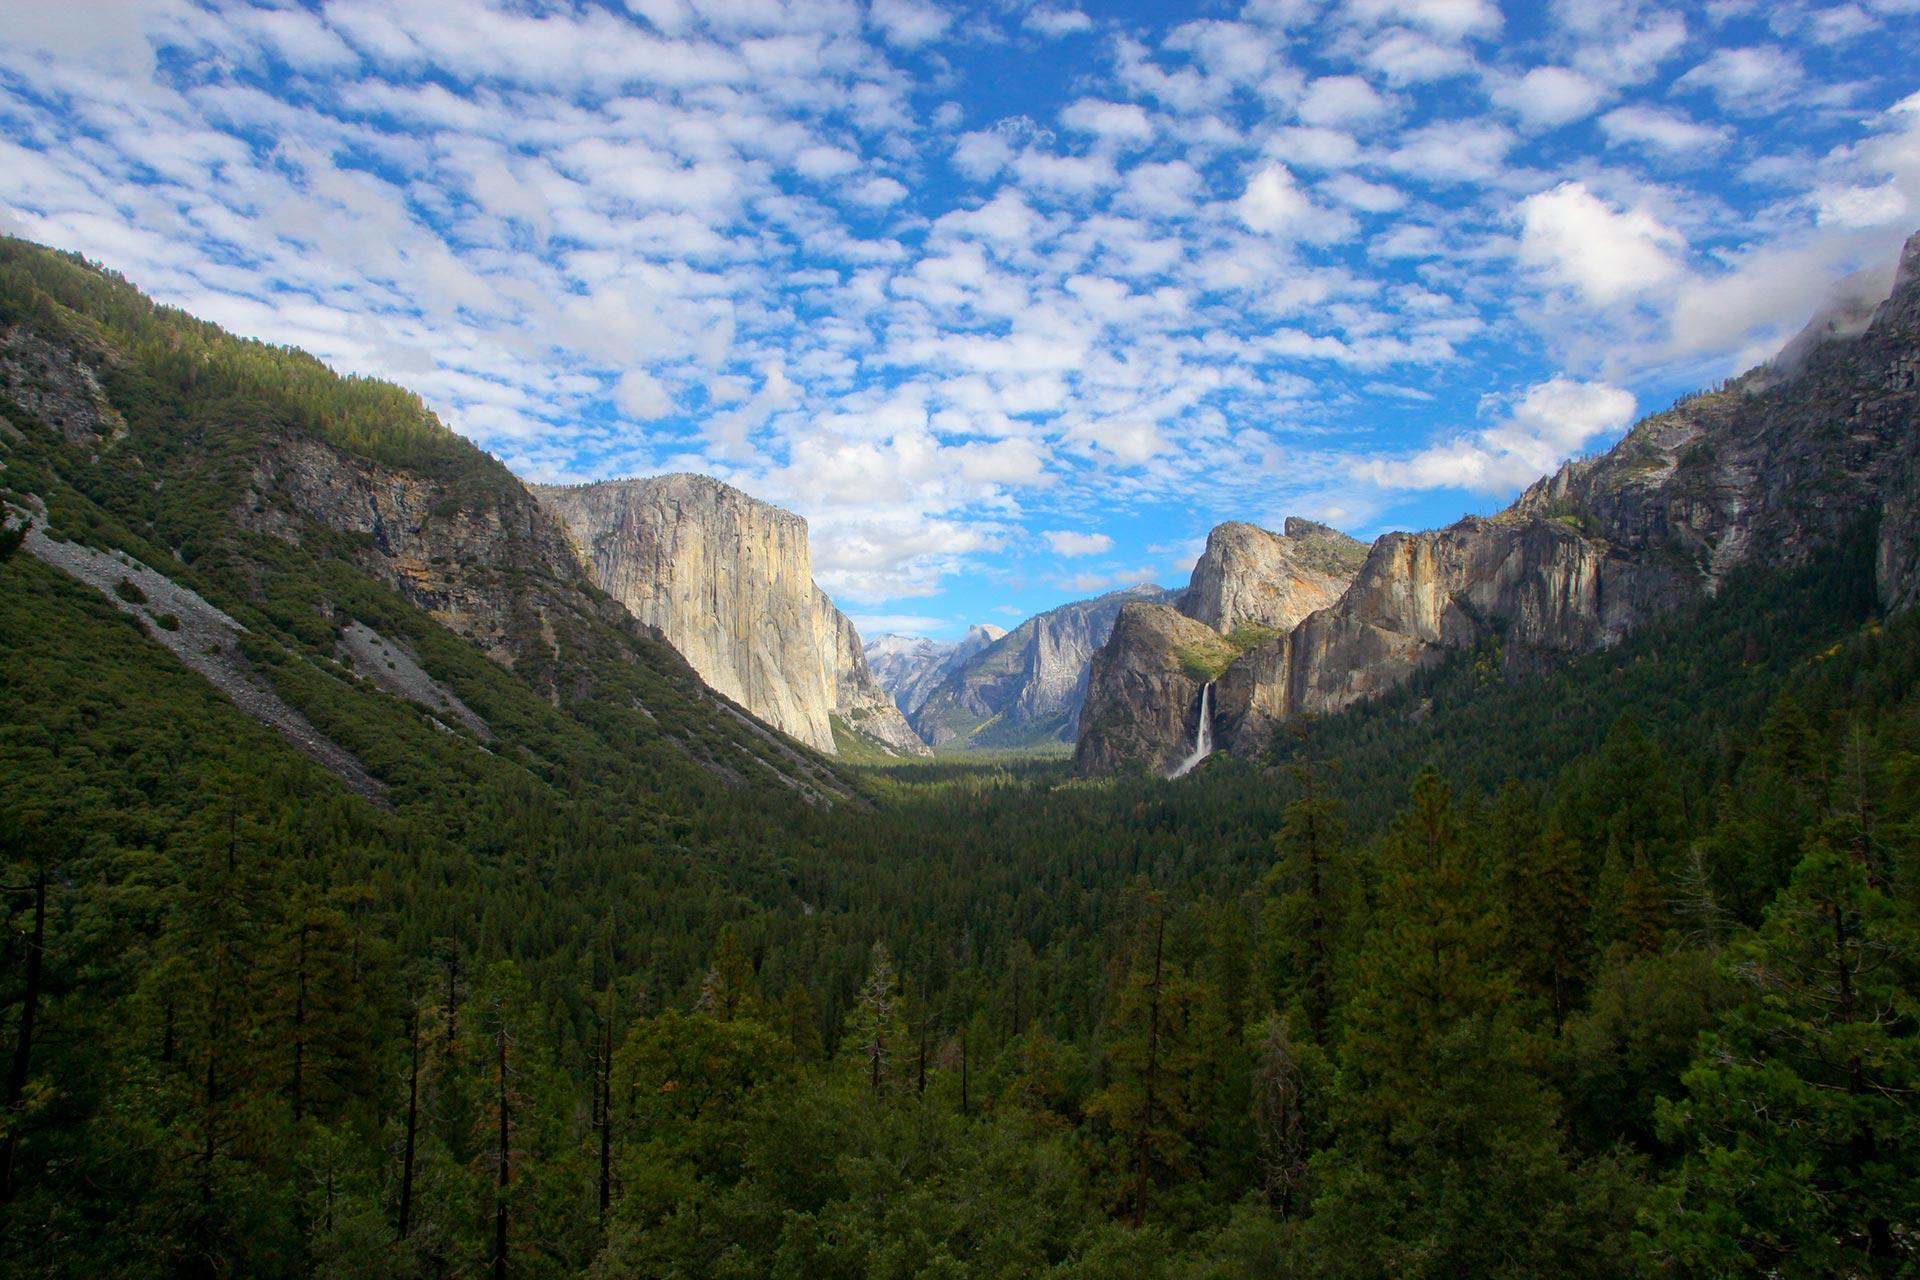 Yosemiten huikeita maisemia. Kuva: TVZ Design, Flickr.com, CC 2.0.